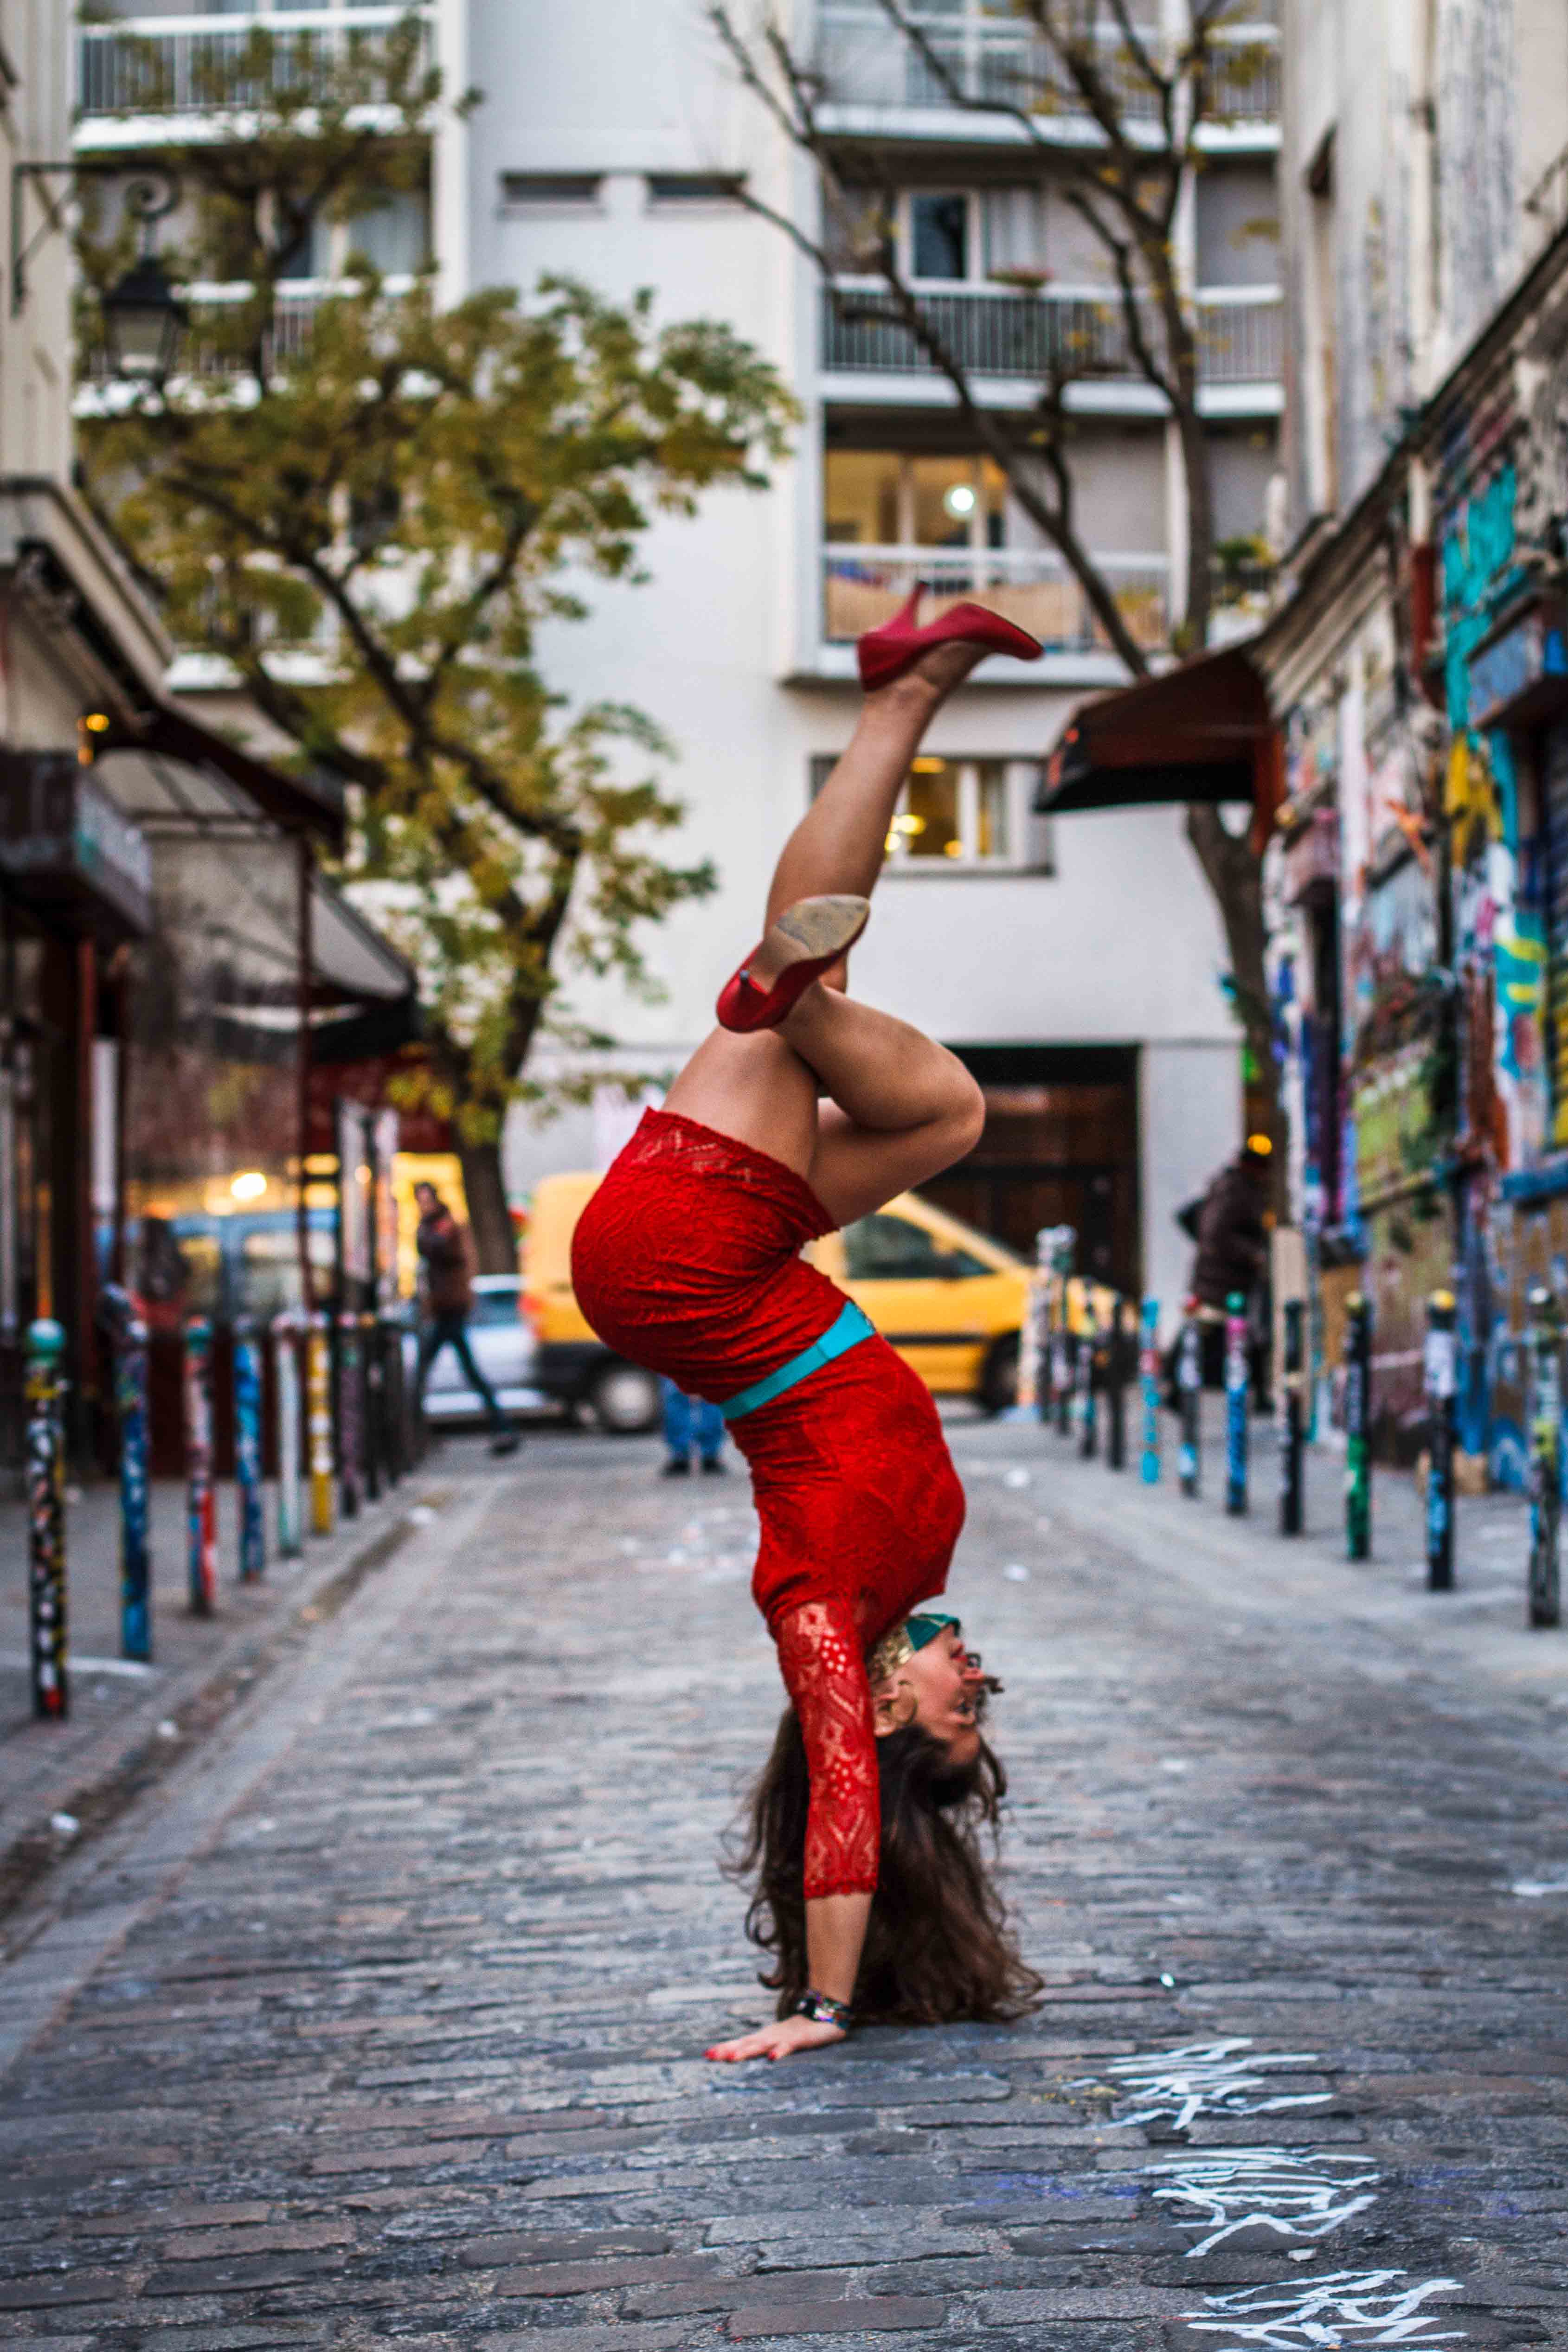 Paris salsa Hip Hop Battle, 104, salsa, hip hop, salsa hip hop fusion, xtremambo, gaelle saint macary, machete, freeze, bgirl, breakdance, rodrigue lino, dj cléon, la matraka, battle de danse